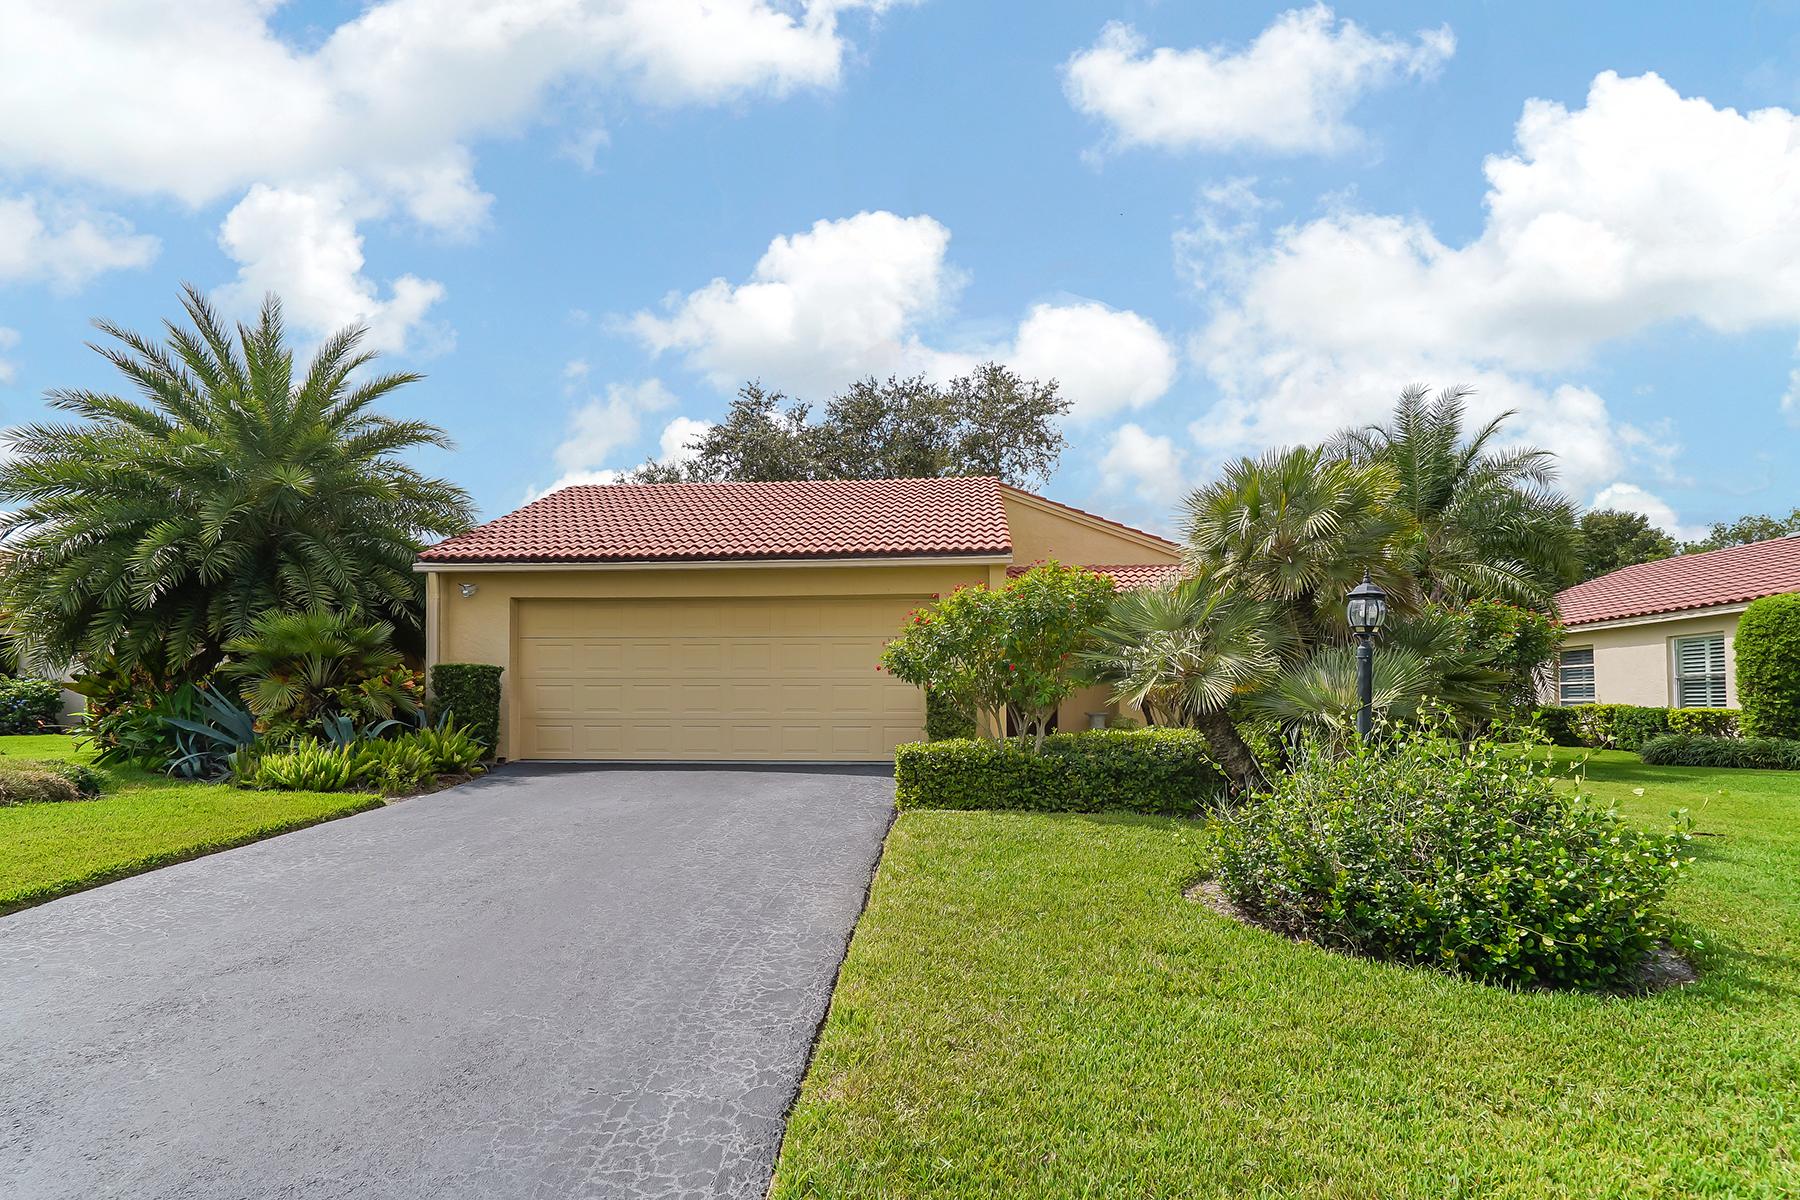 Single Family Home for Sale at LAS CASAS 7228 Las Casas Dr 9, Sarasota, Florida, 34243 United States